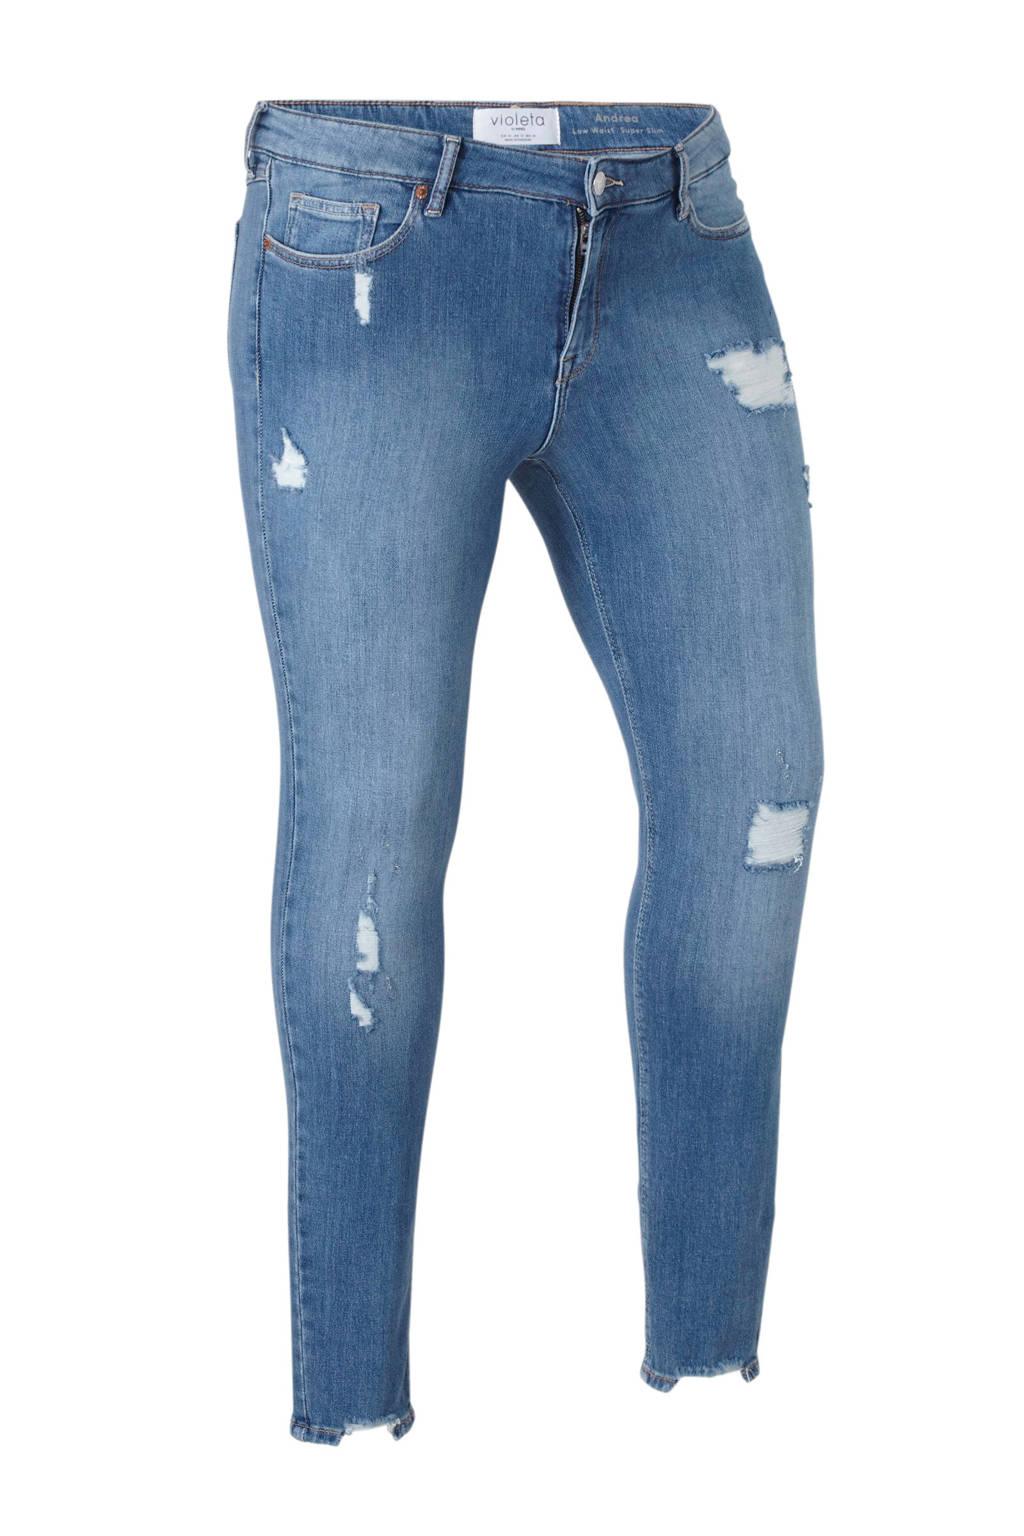 Violeta by Mango low waist slim fit jeans Andrea met slijtage, Stonewashed